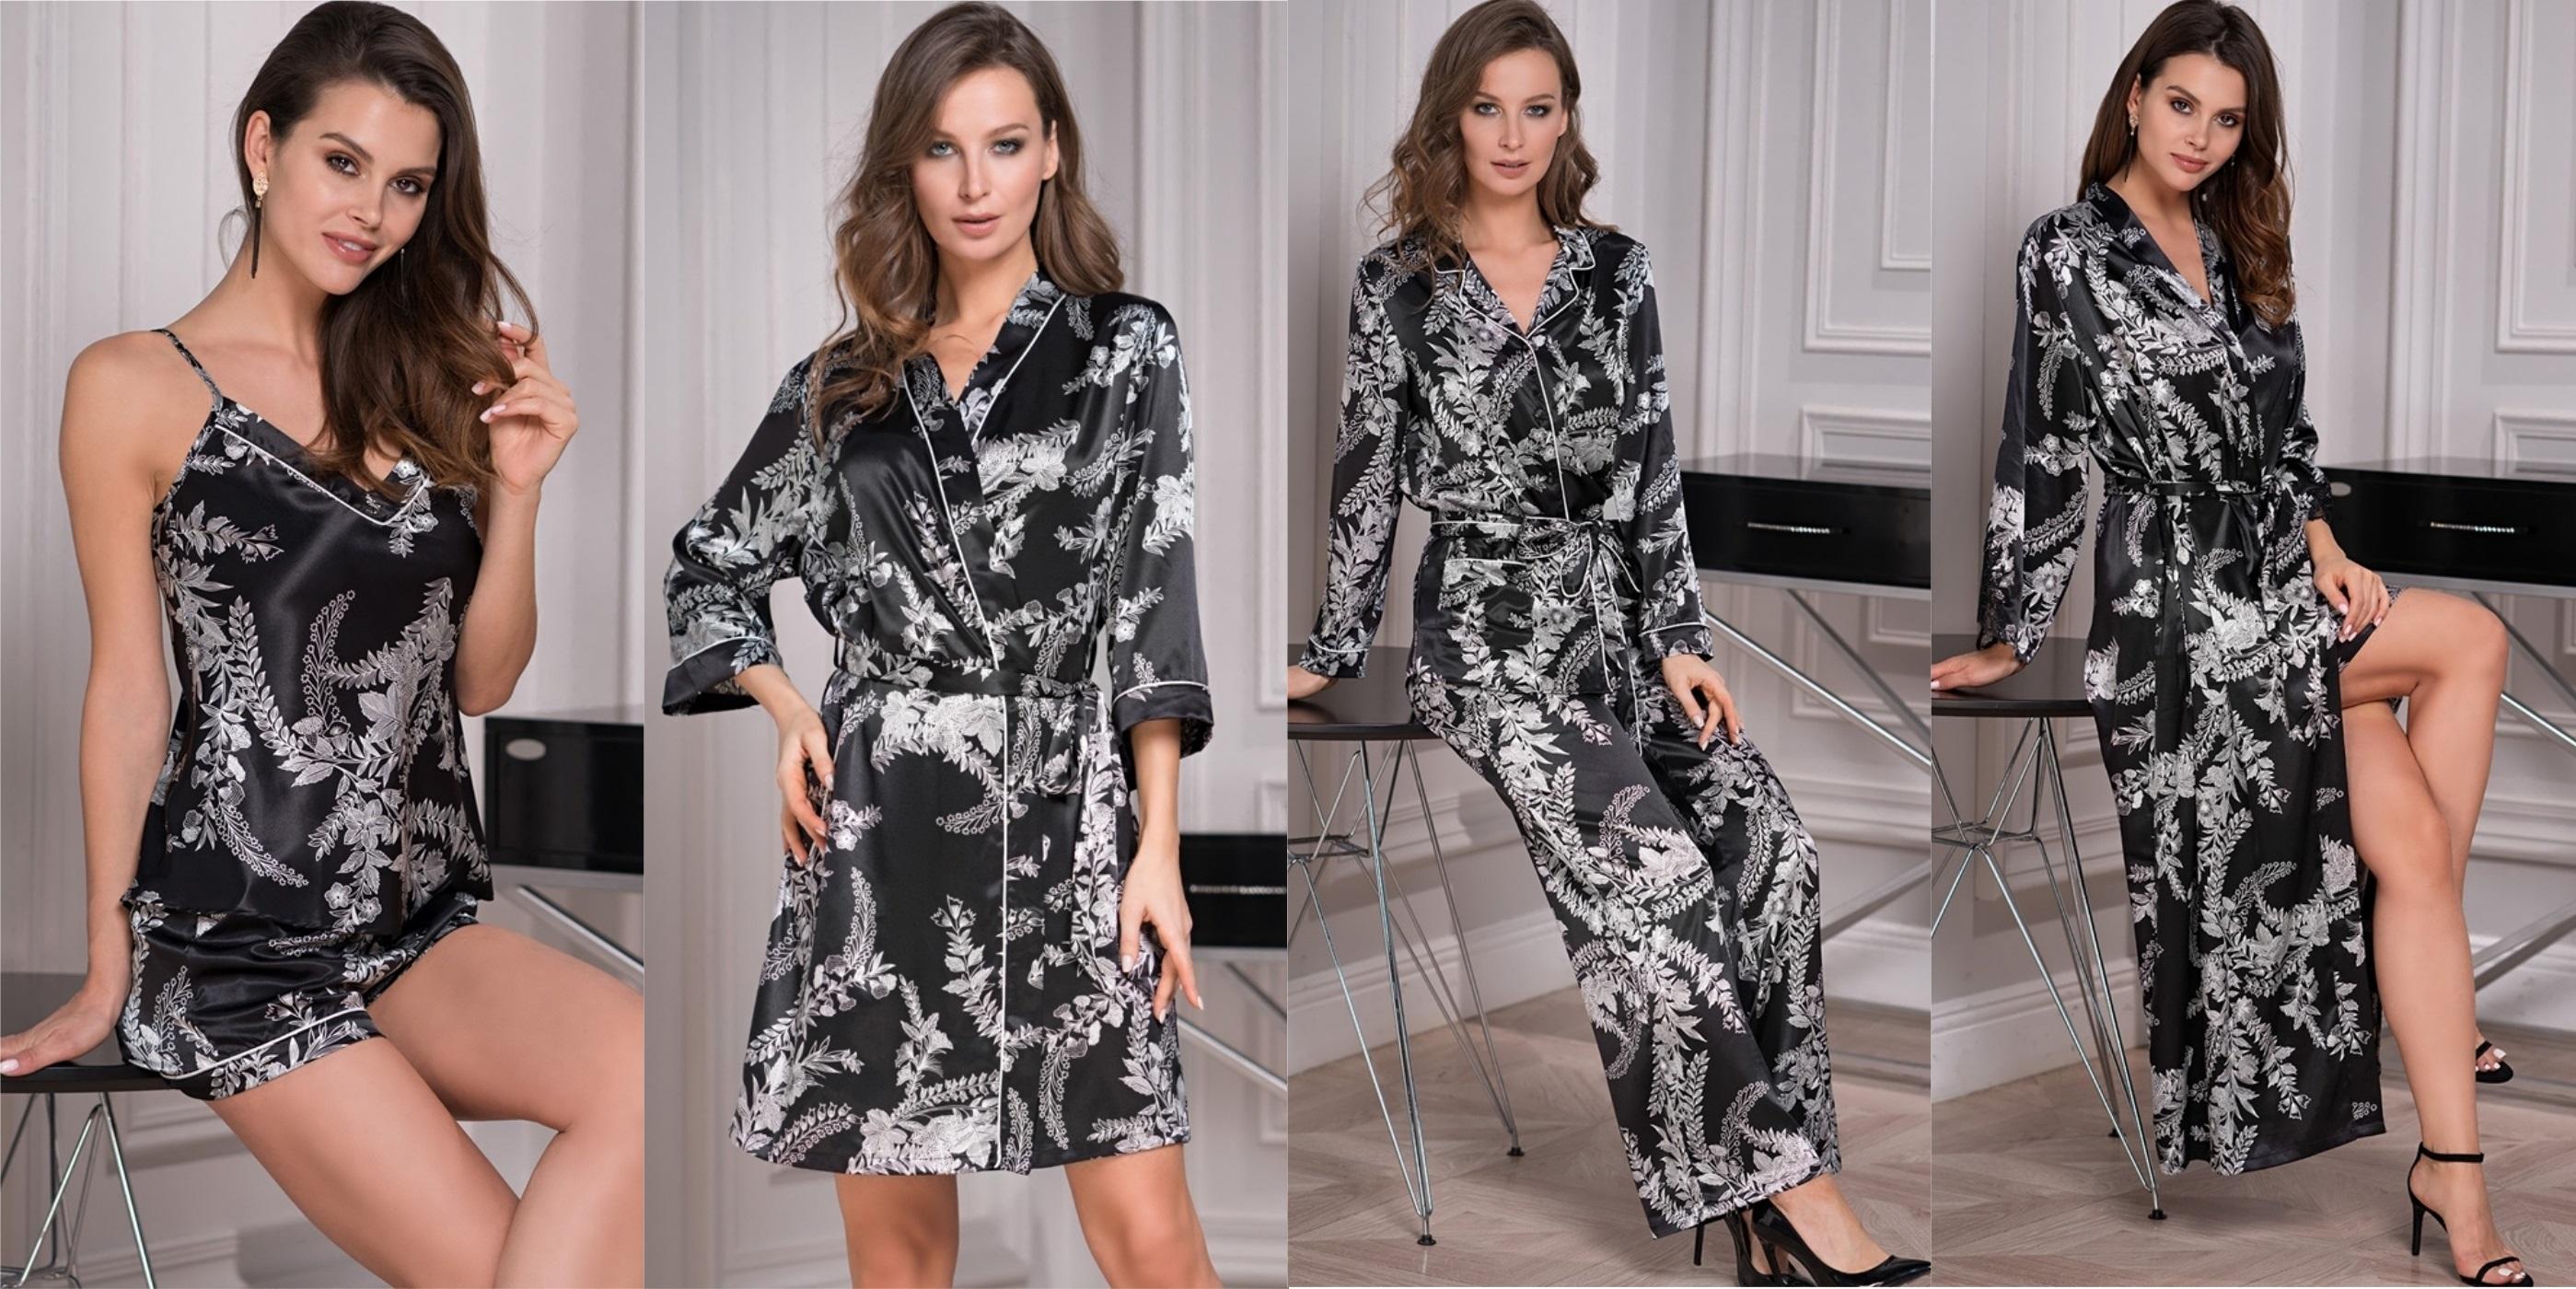 Пижамы, халаты женские Mia-Mia купить